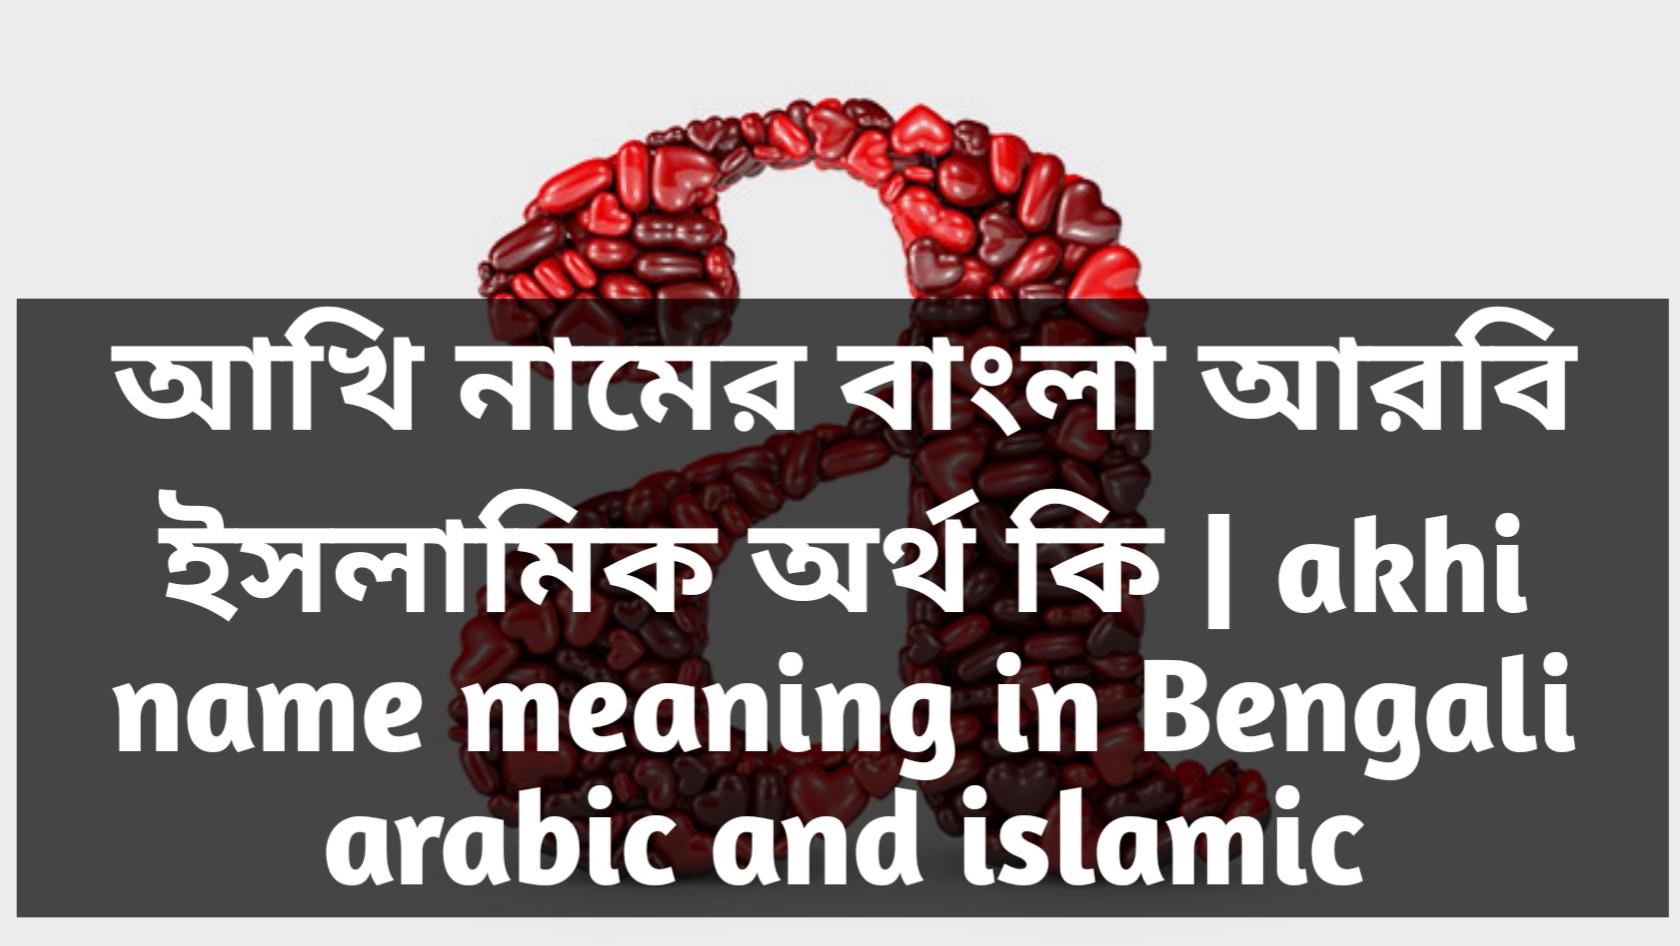 Akhi name meaning in Bengali, আখি নামের অর্থ কি, আখি নামের বাংলা অর্থ কি, আখি নামের ইসলামিক অর্থ কি,